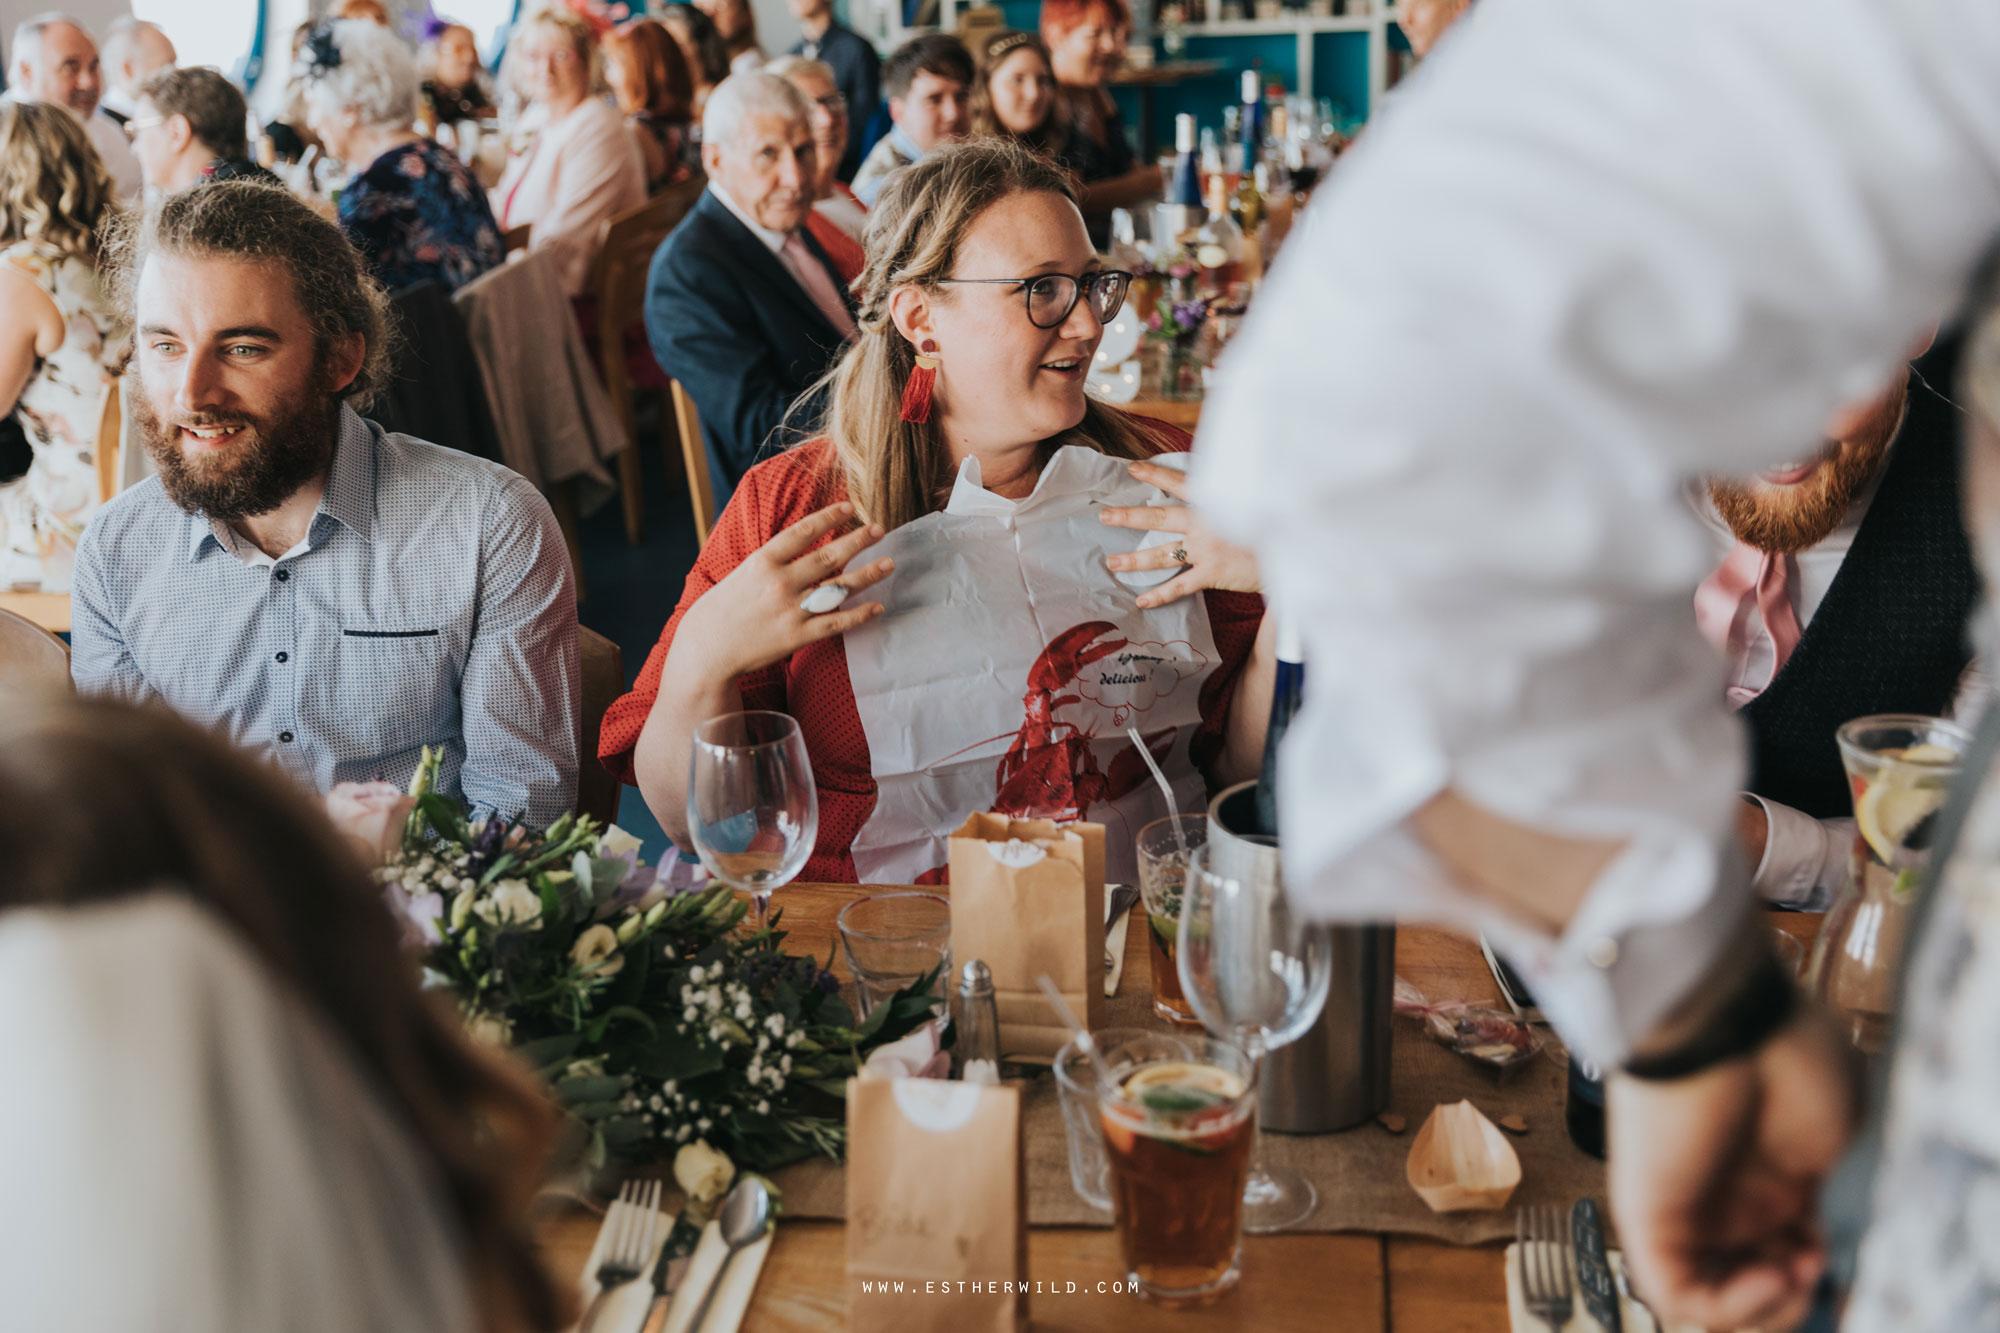 Cromer_Wedding_Beach_Outdoor_Ceremony_Norfolk_North_Lodge_Registry_Office_Rocket_House_Cafe_Cromer_Pier_IMG_4928.jpg